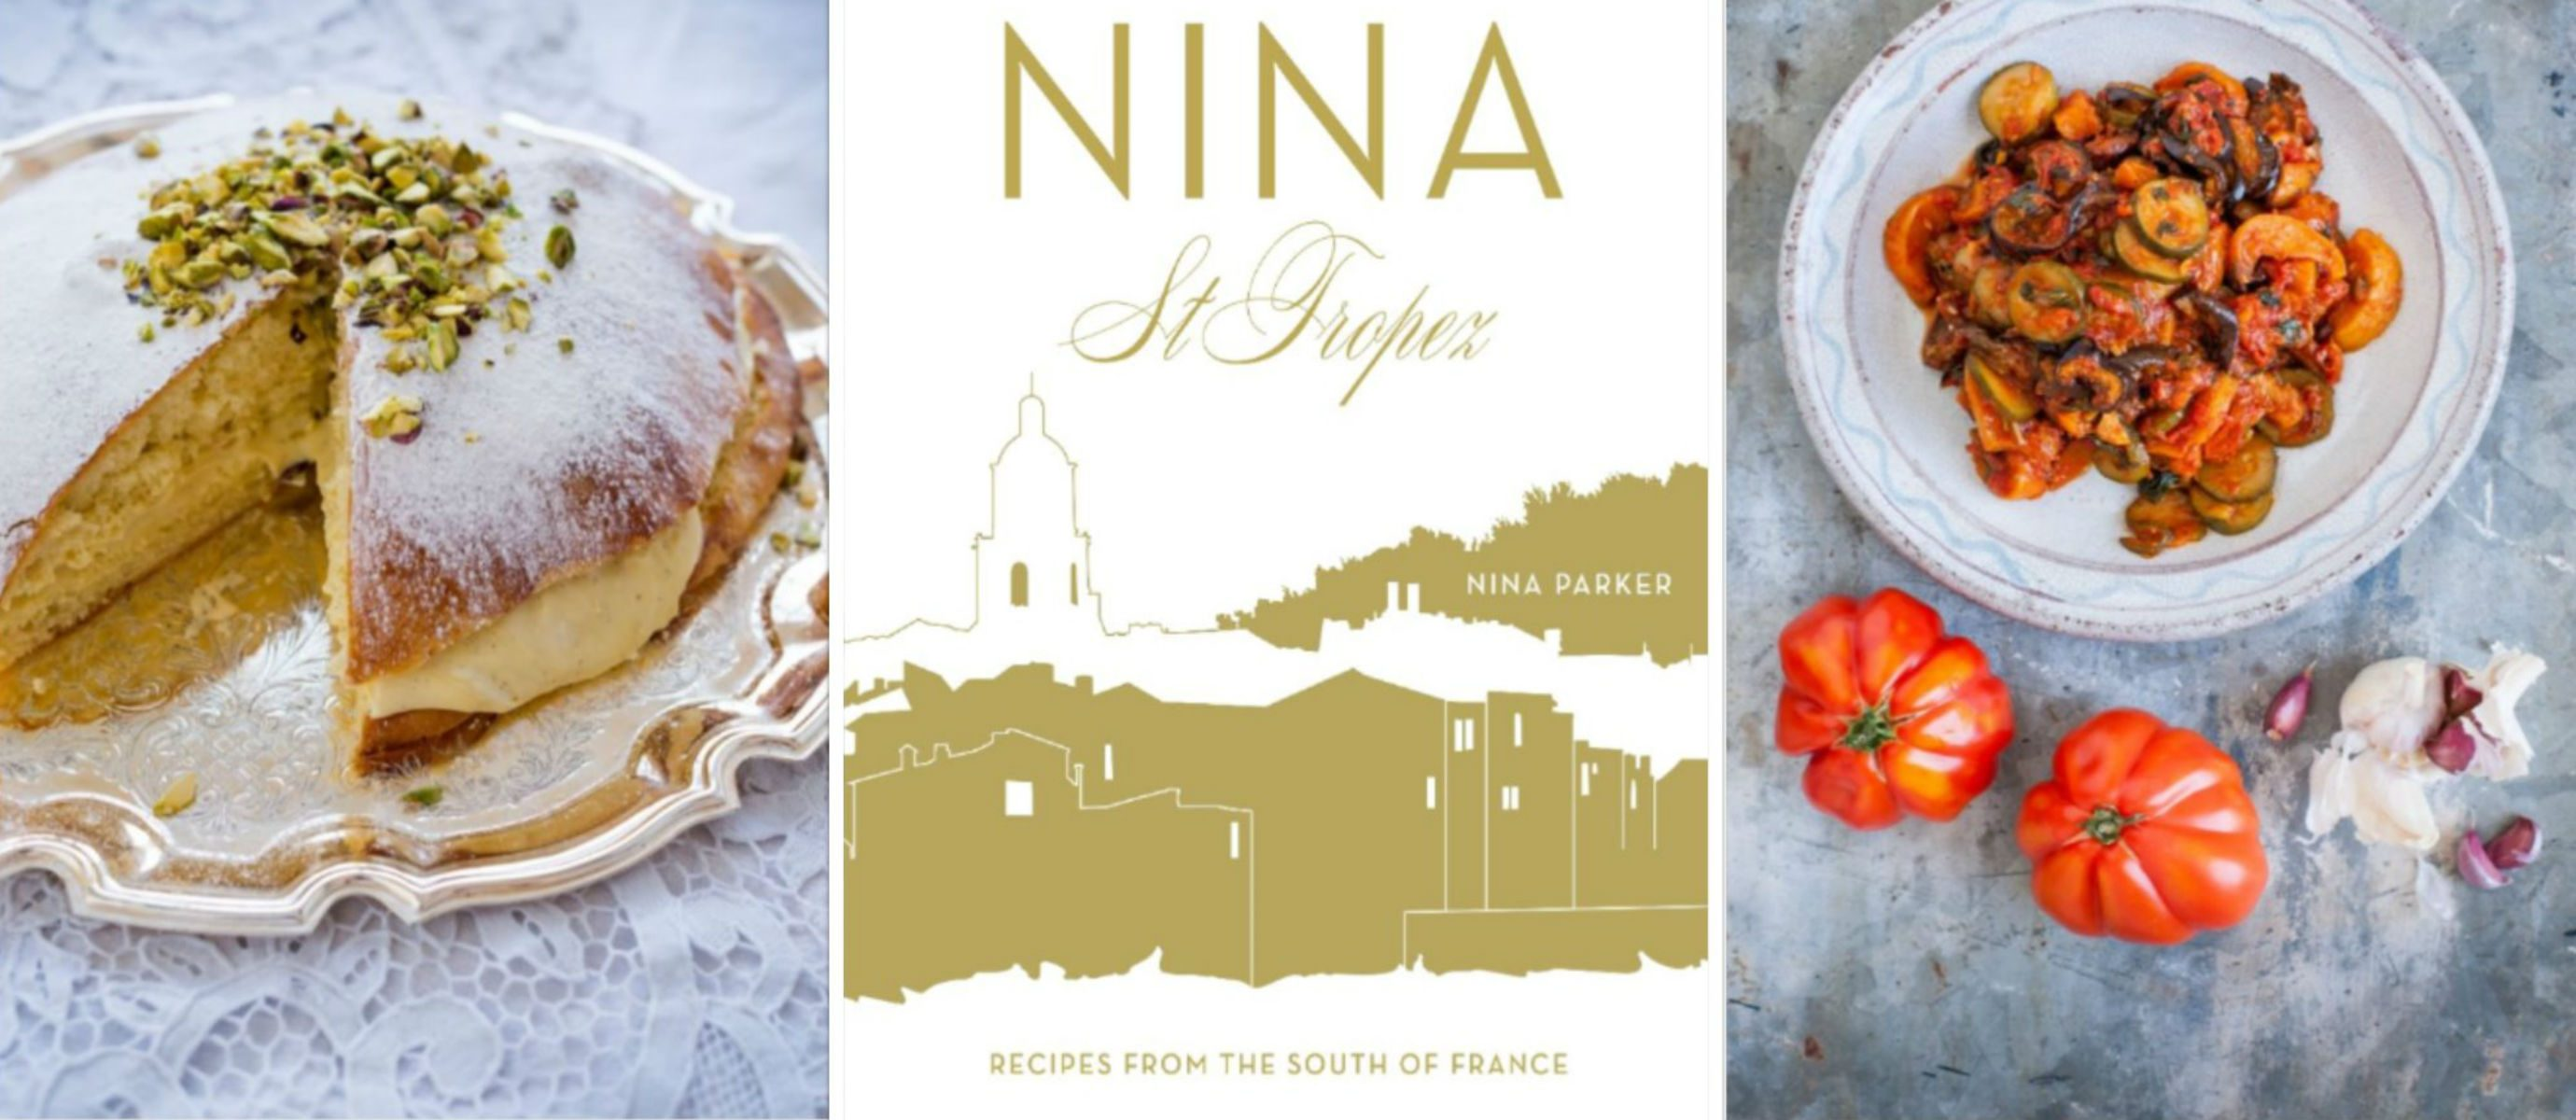 NINA.header